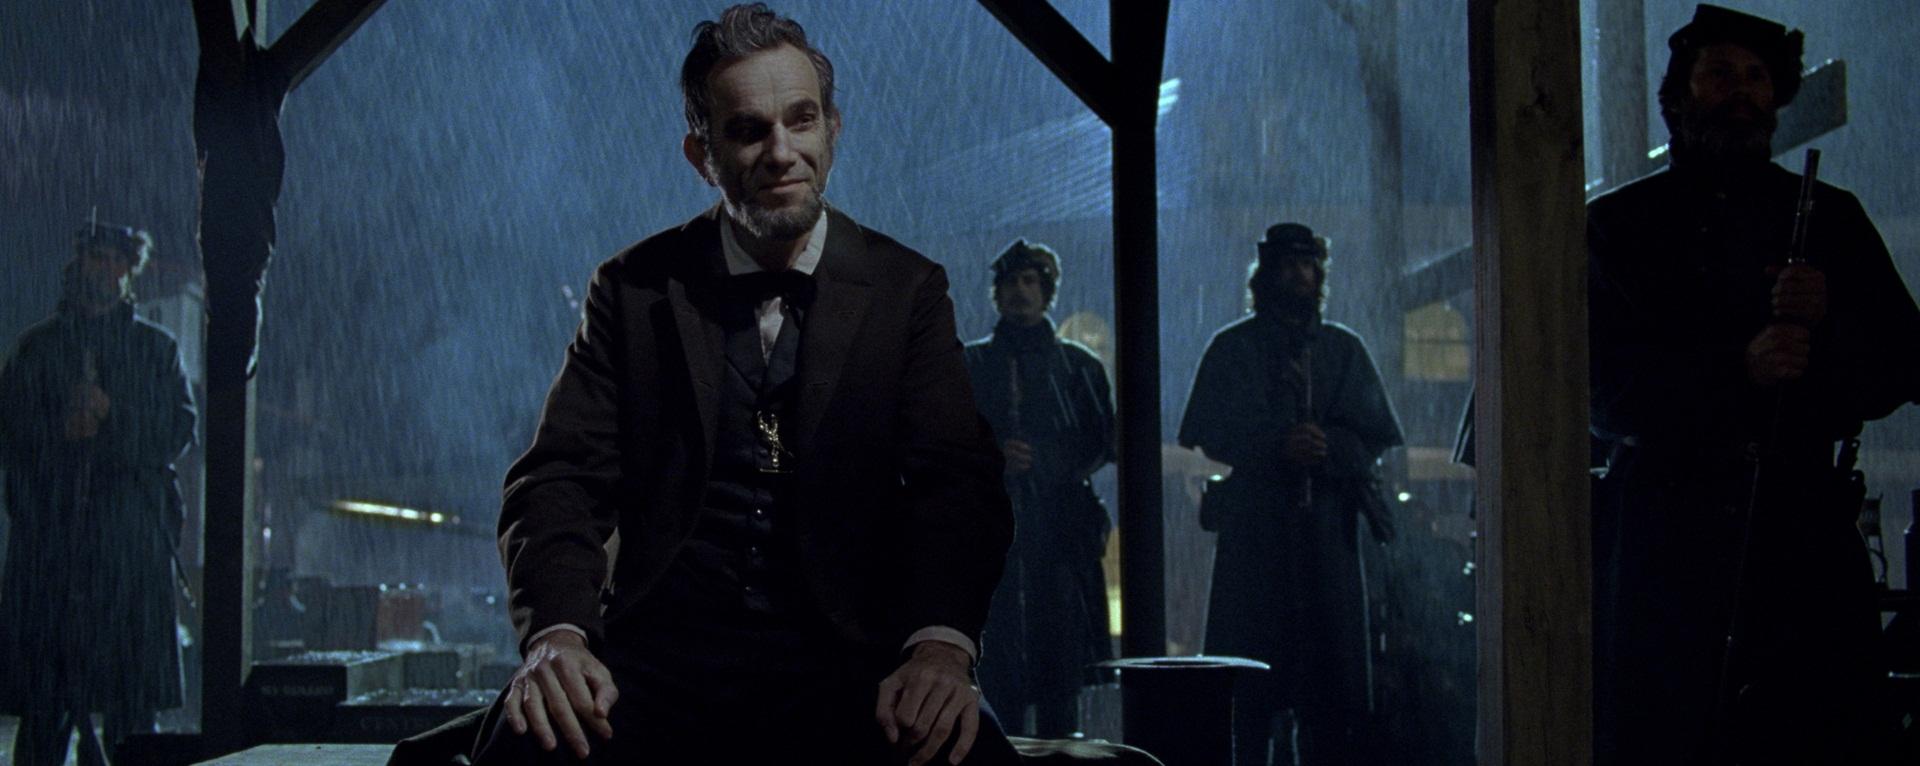 https://i1.wp.com/www.filmofilia.com/wp-content/uploads/2012/09/Lincoln-Daniel-Day-Lewis2.jpg